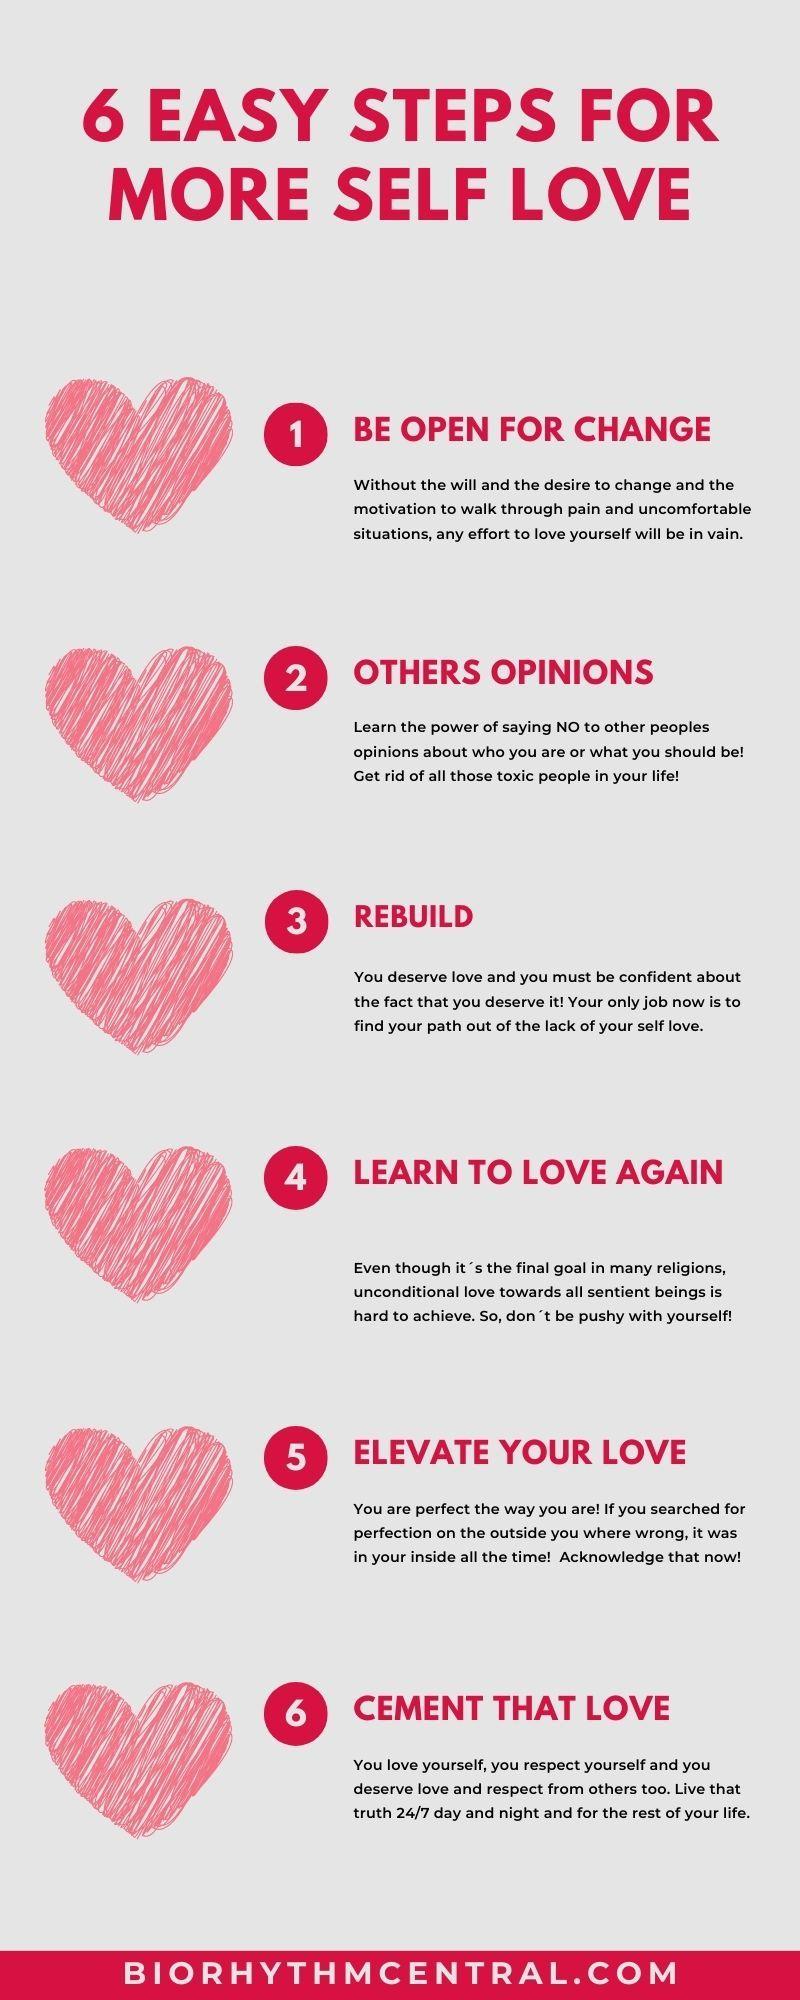 6 easy steps towards self love